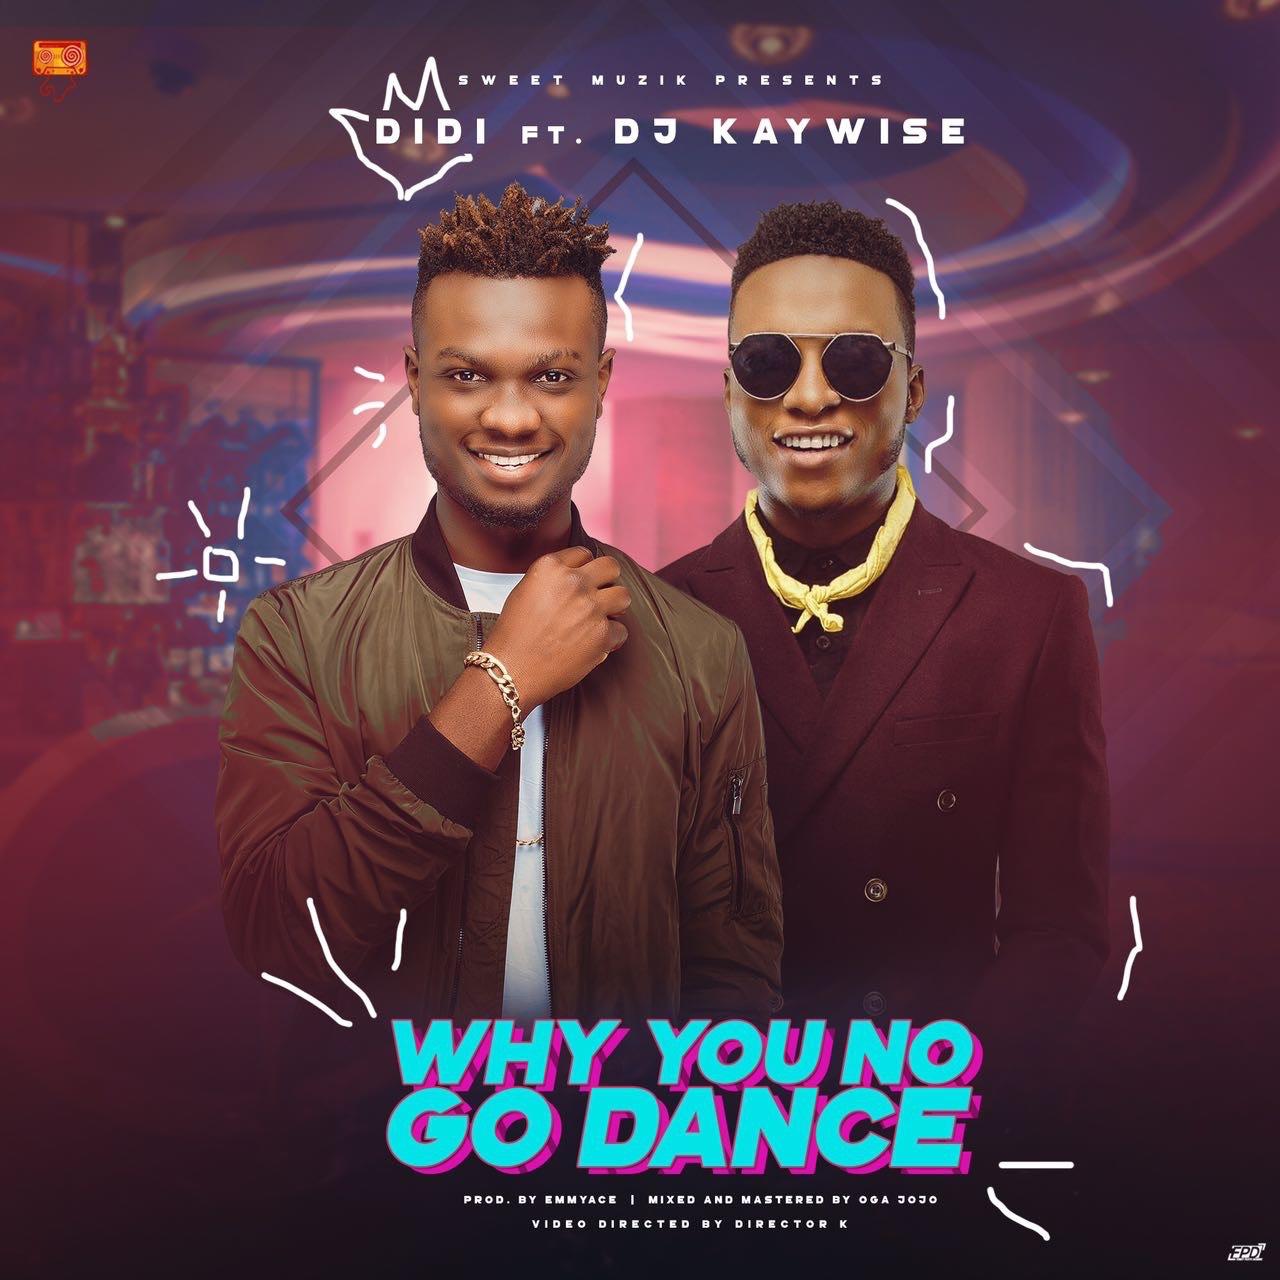 VIDEO: DiDi Ft. DJ Kaywise – Why U No Go Dance